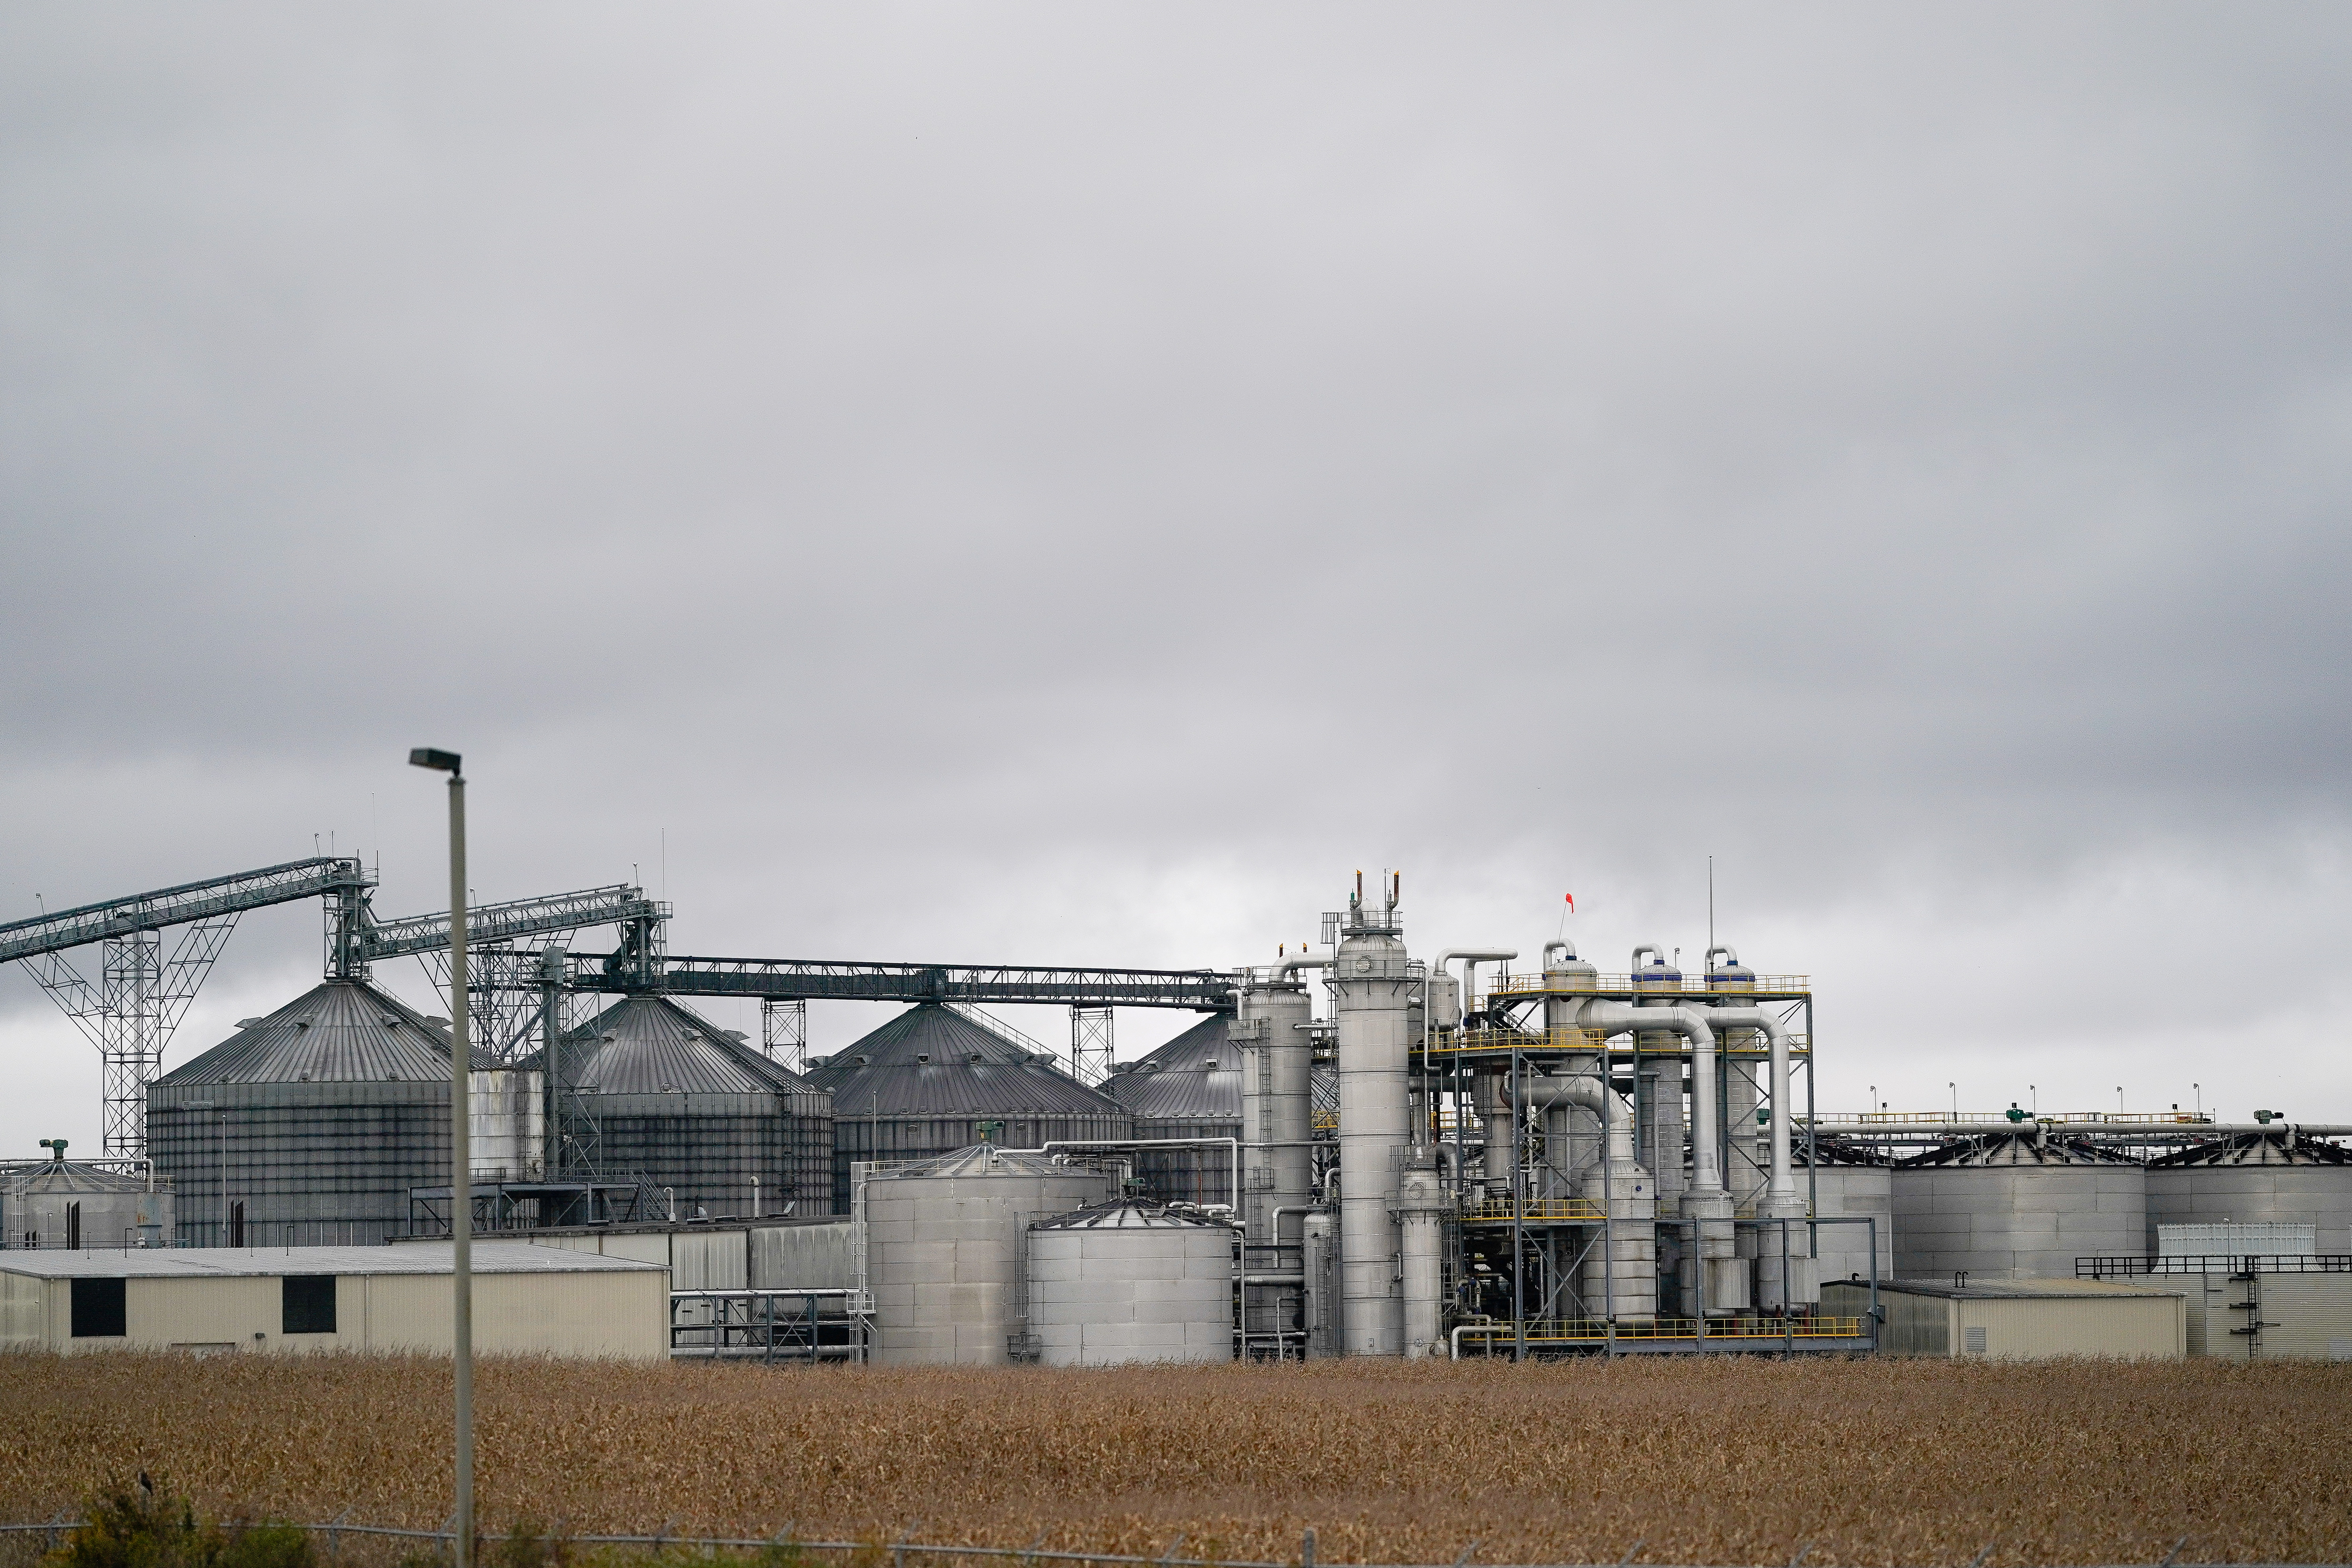 POET Biorefining plant in Cloverdale, Indiana, U.S. October 29, 2019. REUTERS/Bryan Woolston/File Photo